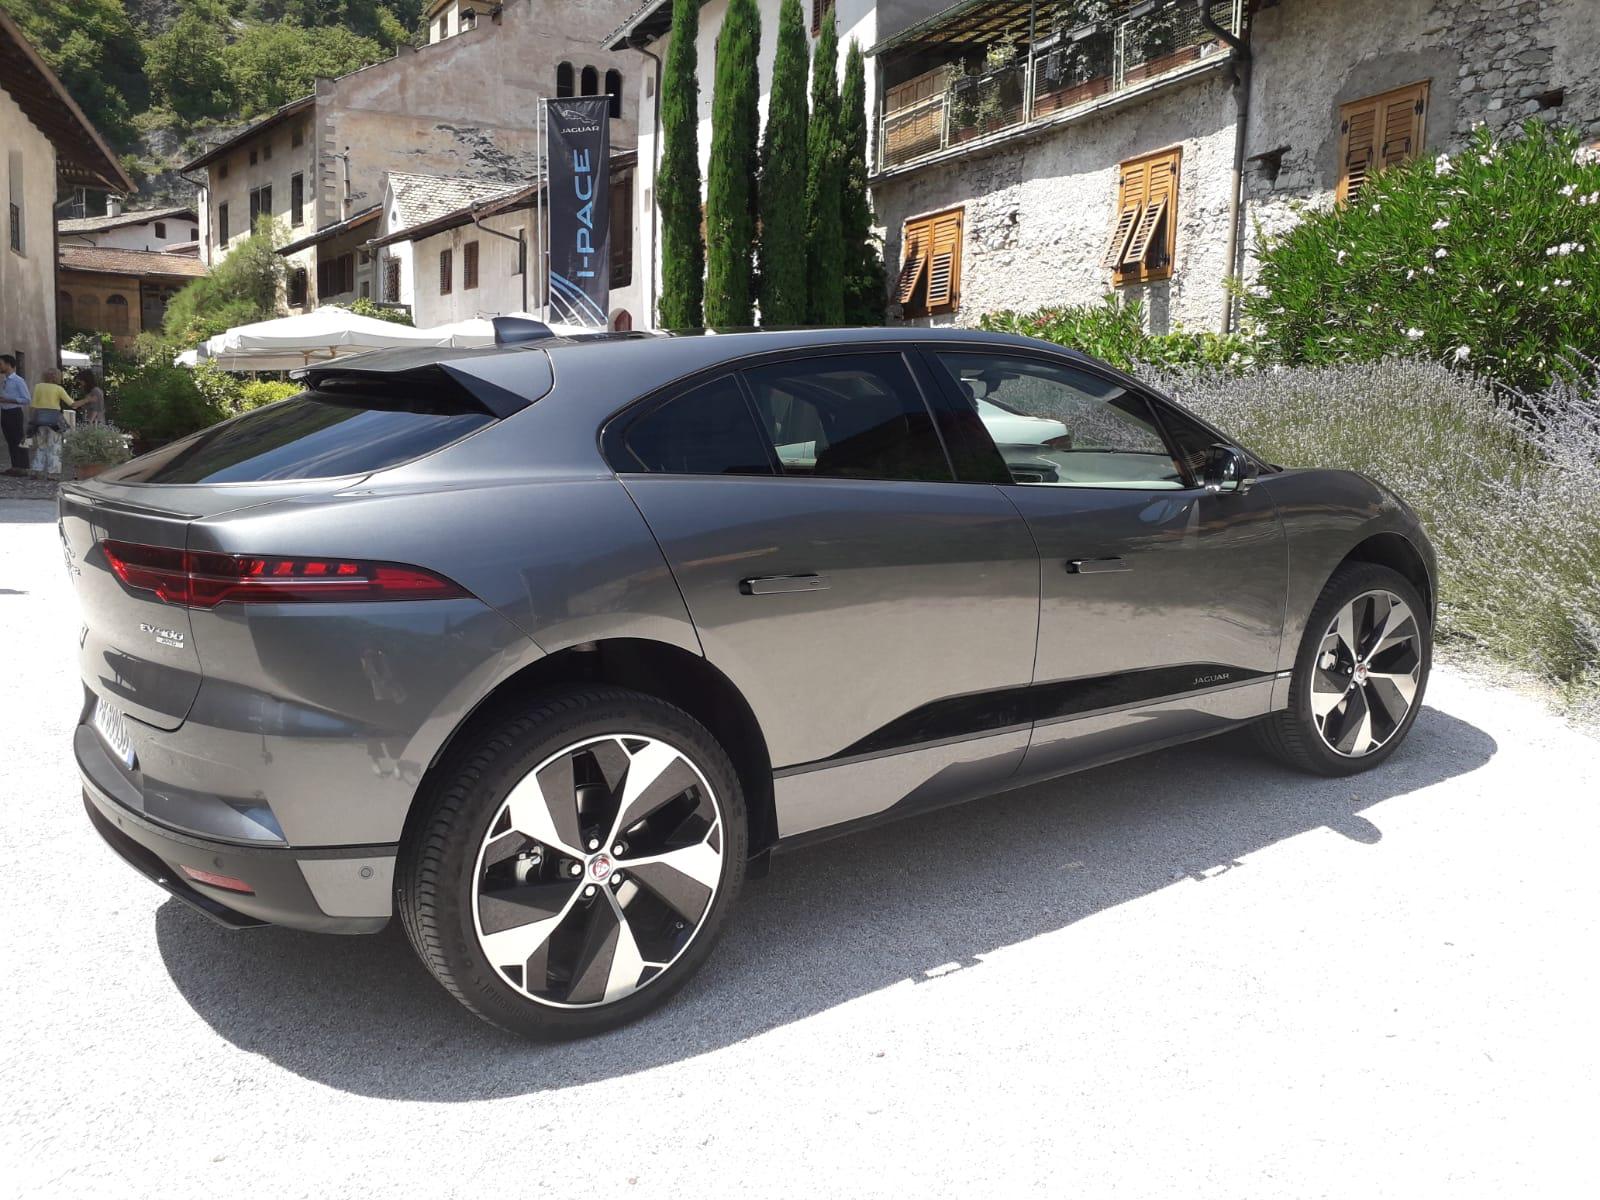 jaguar-i-pace-designe-esterni-fiancata